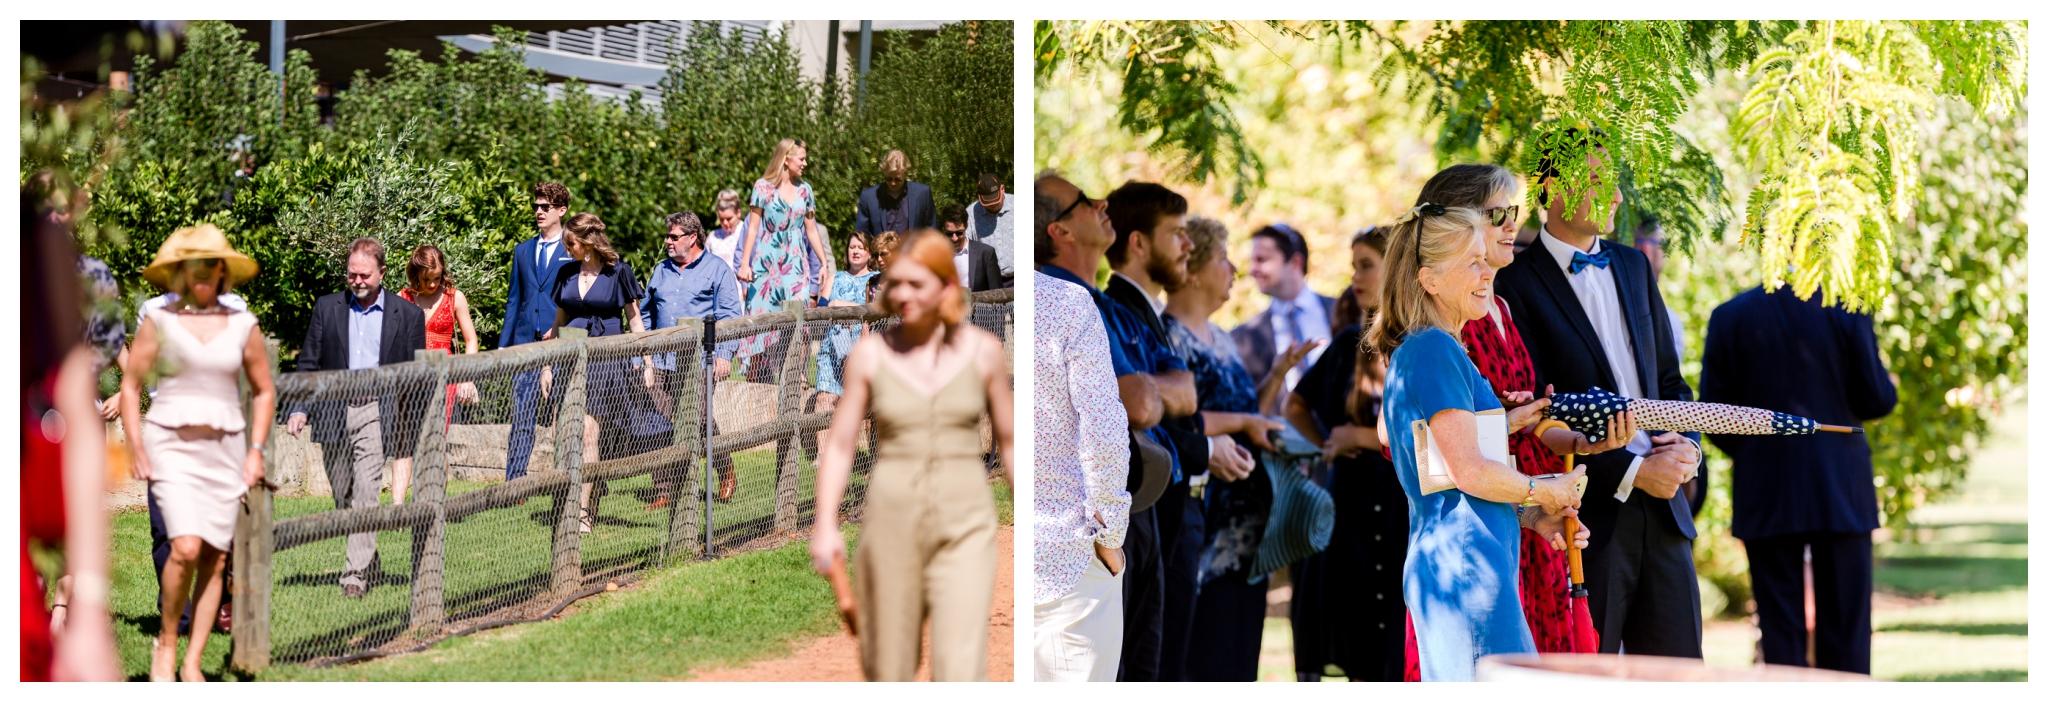 core-cider-house-wedding-ceremony